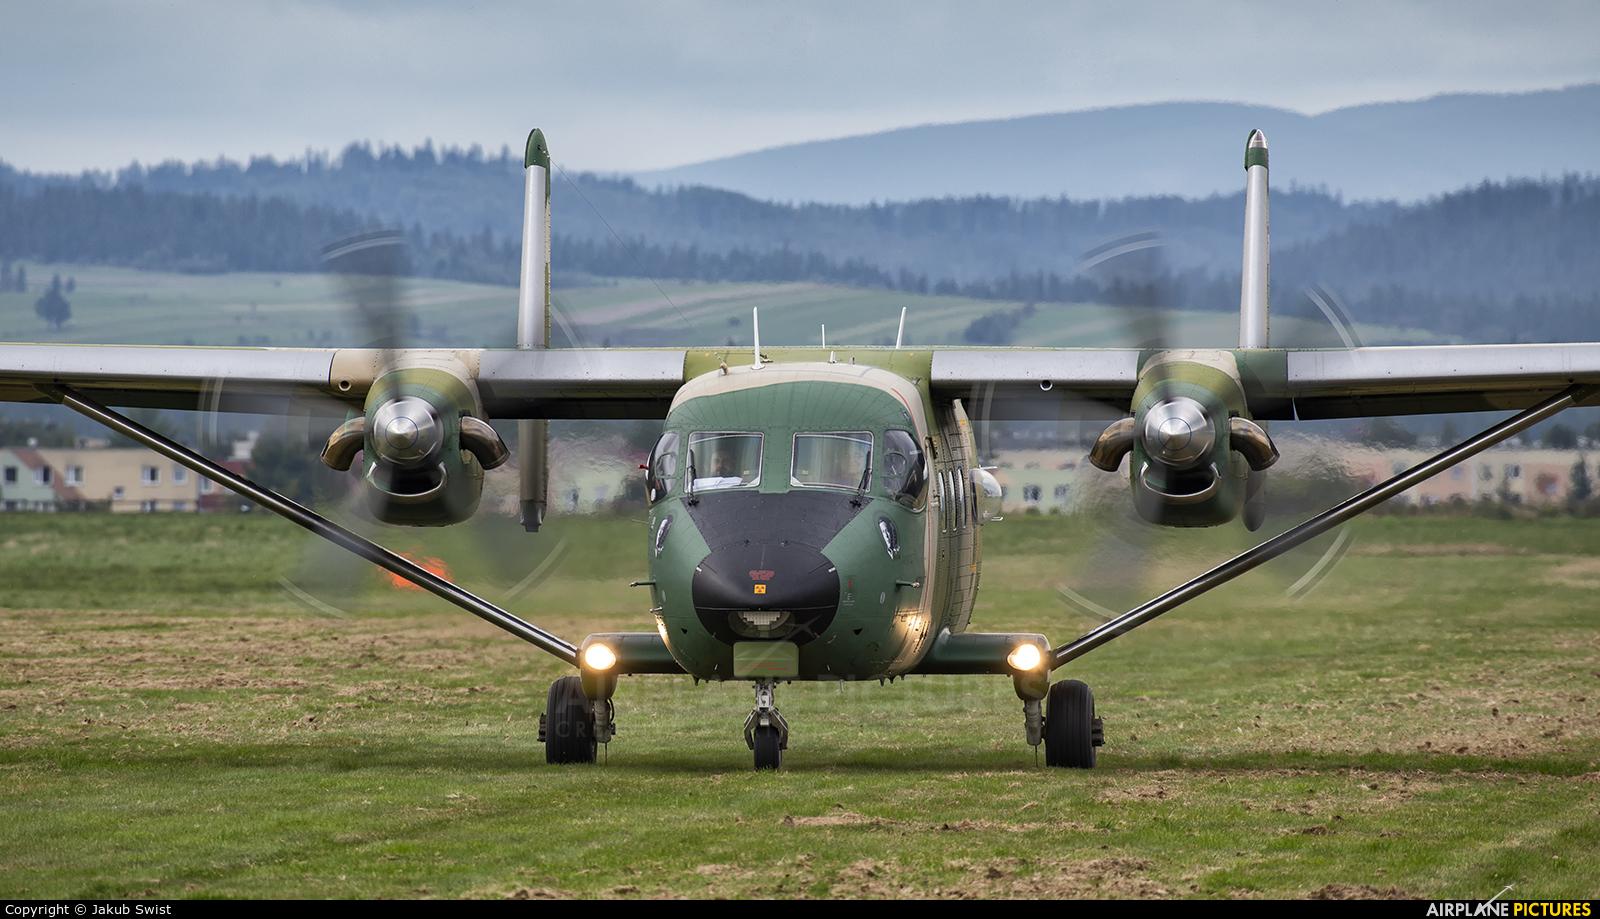 Poland - Air Force 0219 aircraft at Nowy Targ